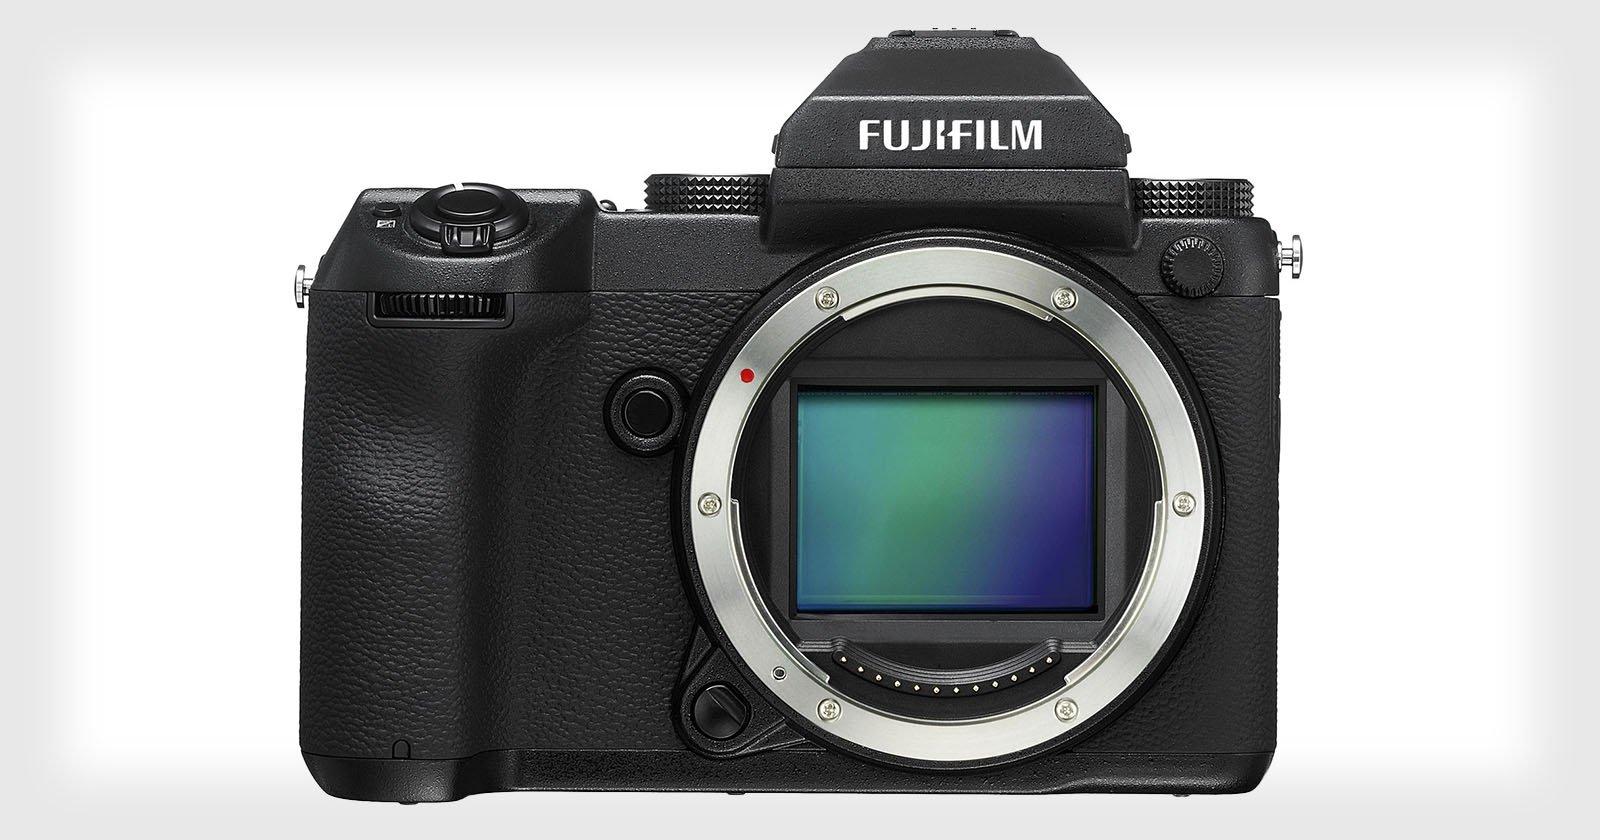 Fujifilm's Medium Format GFX 50S to Ship in February for $6,500